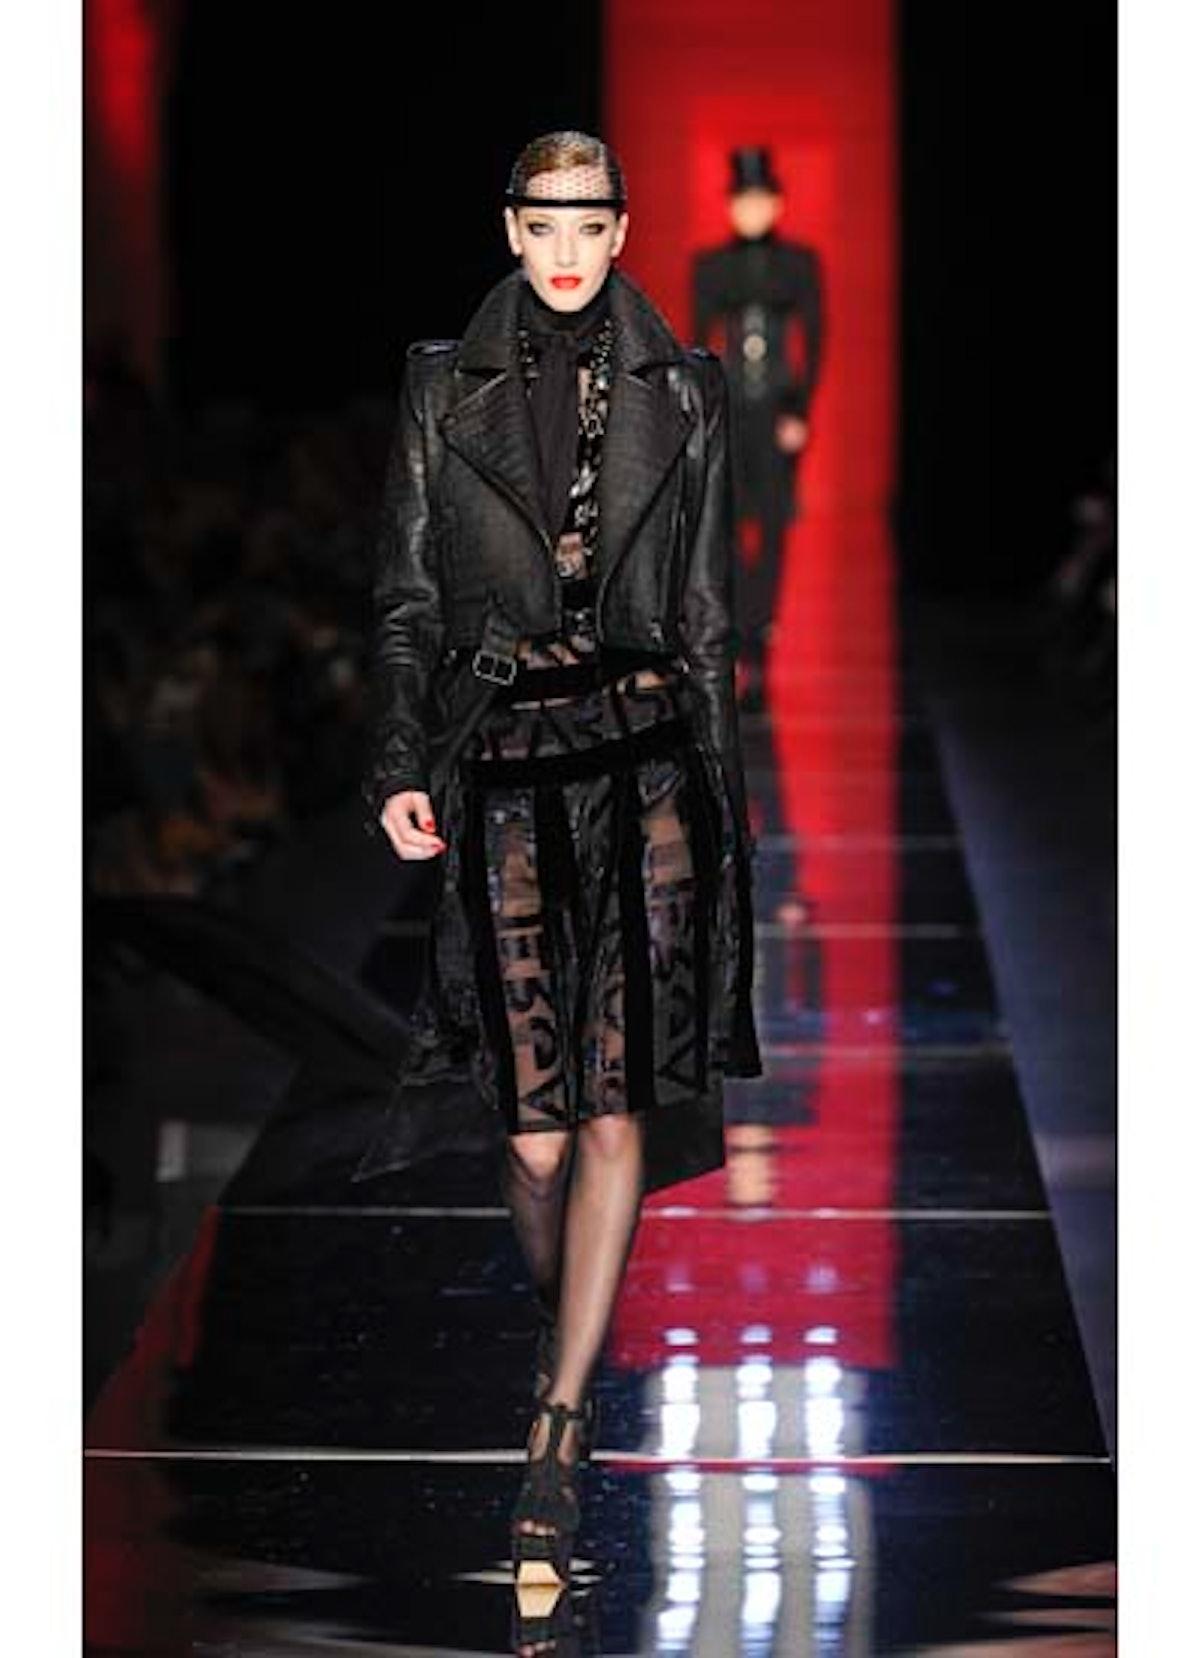 fass-jean-paul-gaultier-couture-2012-runway-10-v.jpg